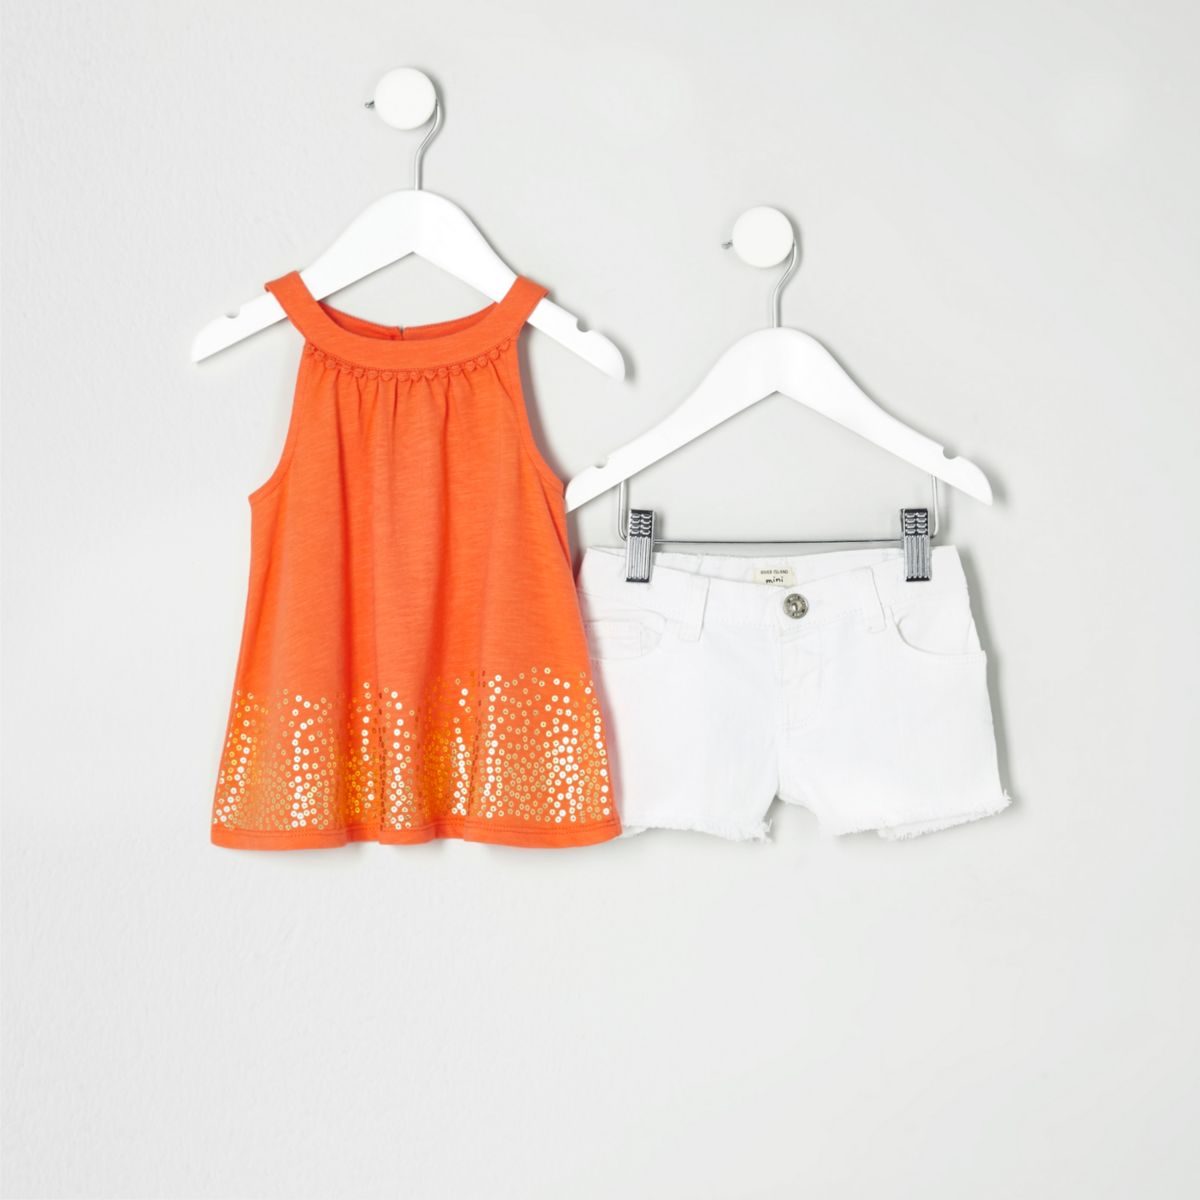 Mini girls orange trapeze top outfit